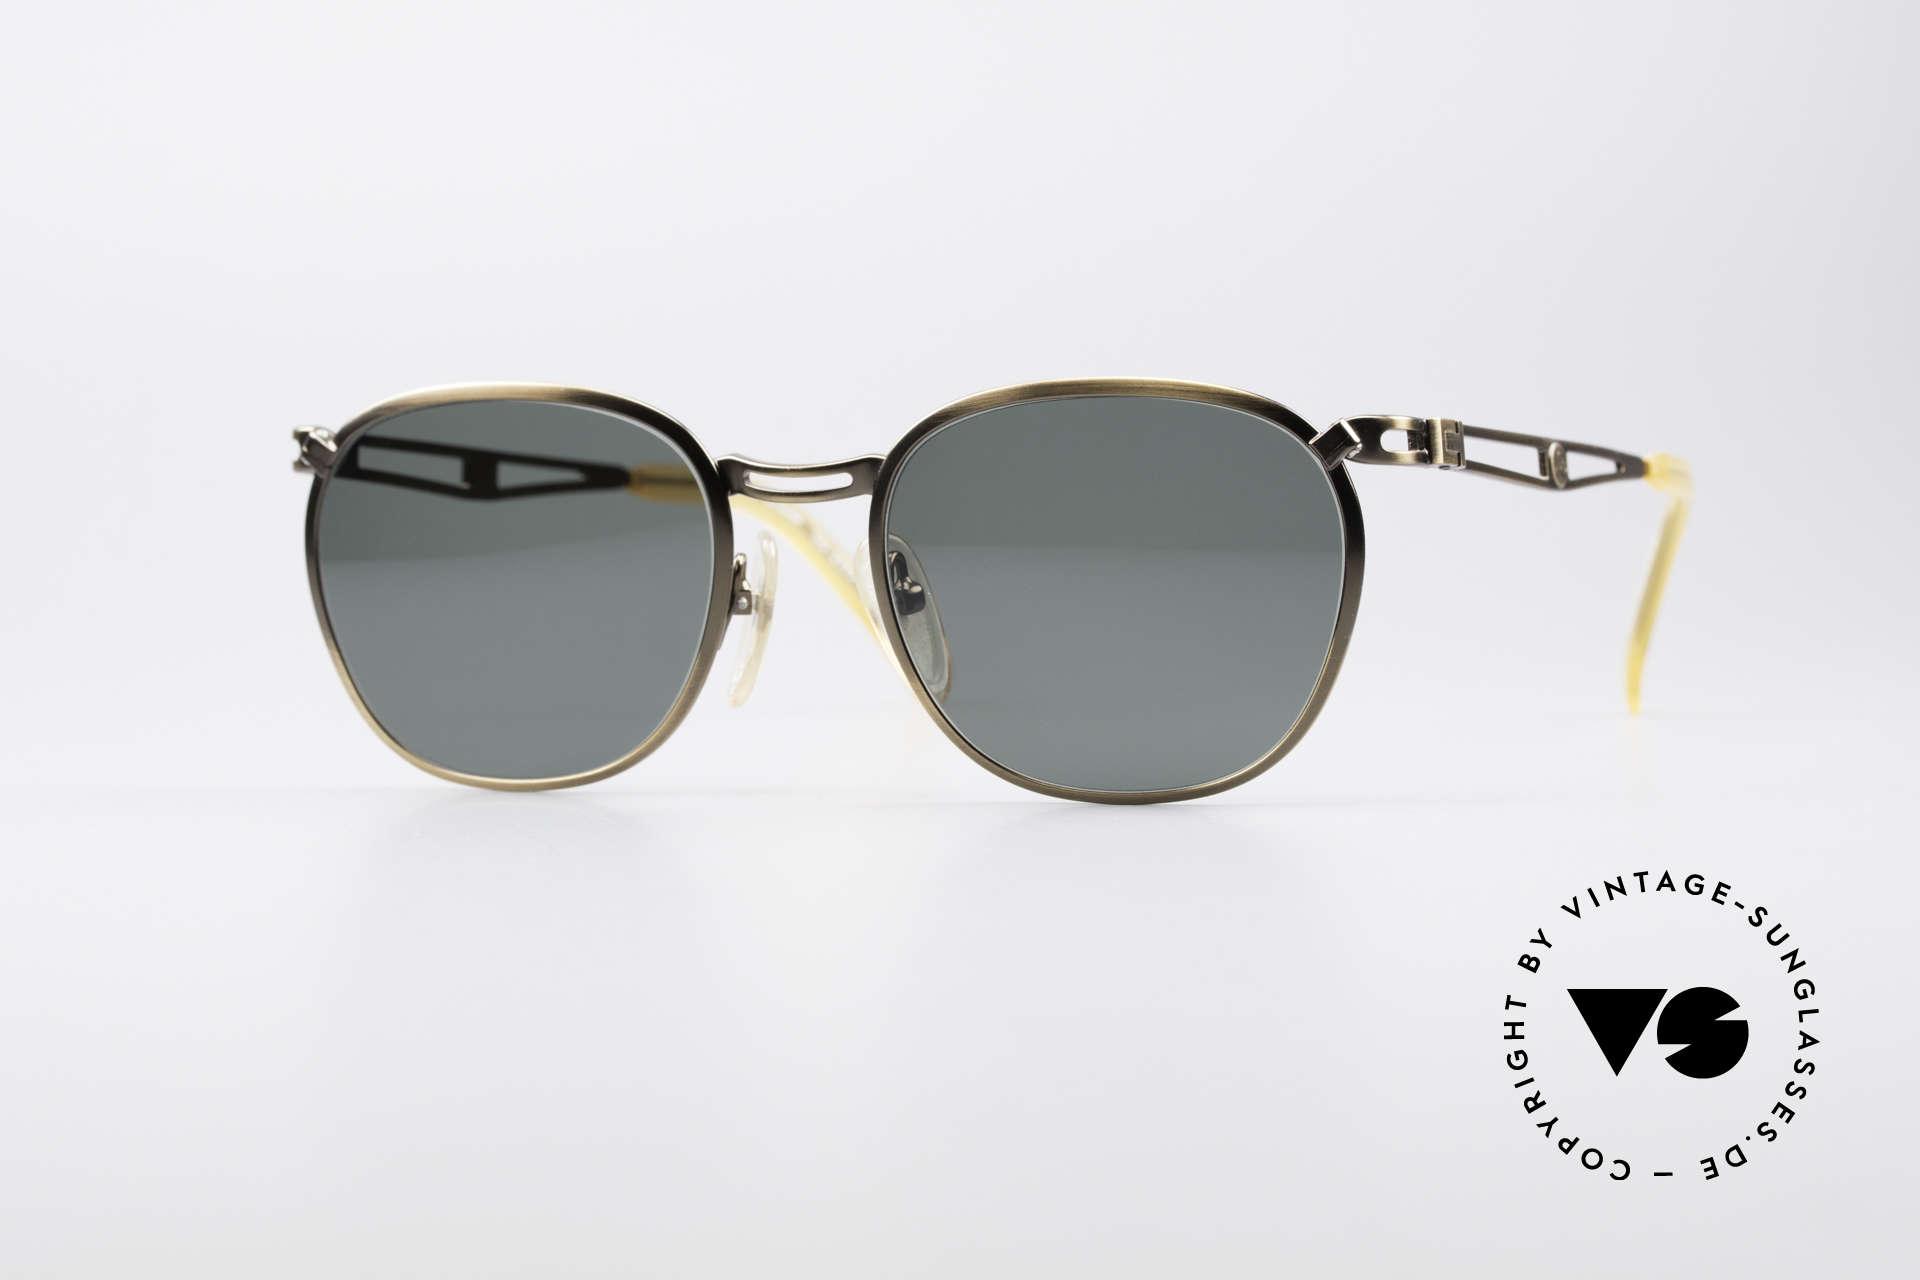 Jean Paul Gaultier 56-2177 90's Designer Sunglasses, 1990's designer sunglasses by Jean Paul Gaultier, Made for Men and Women